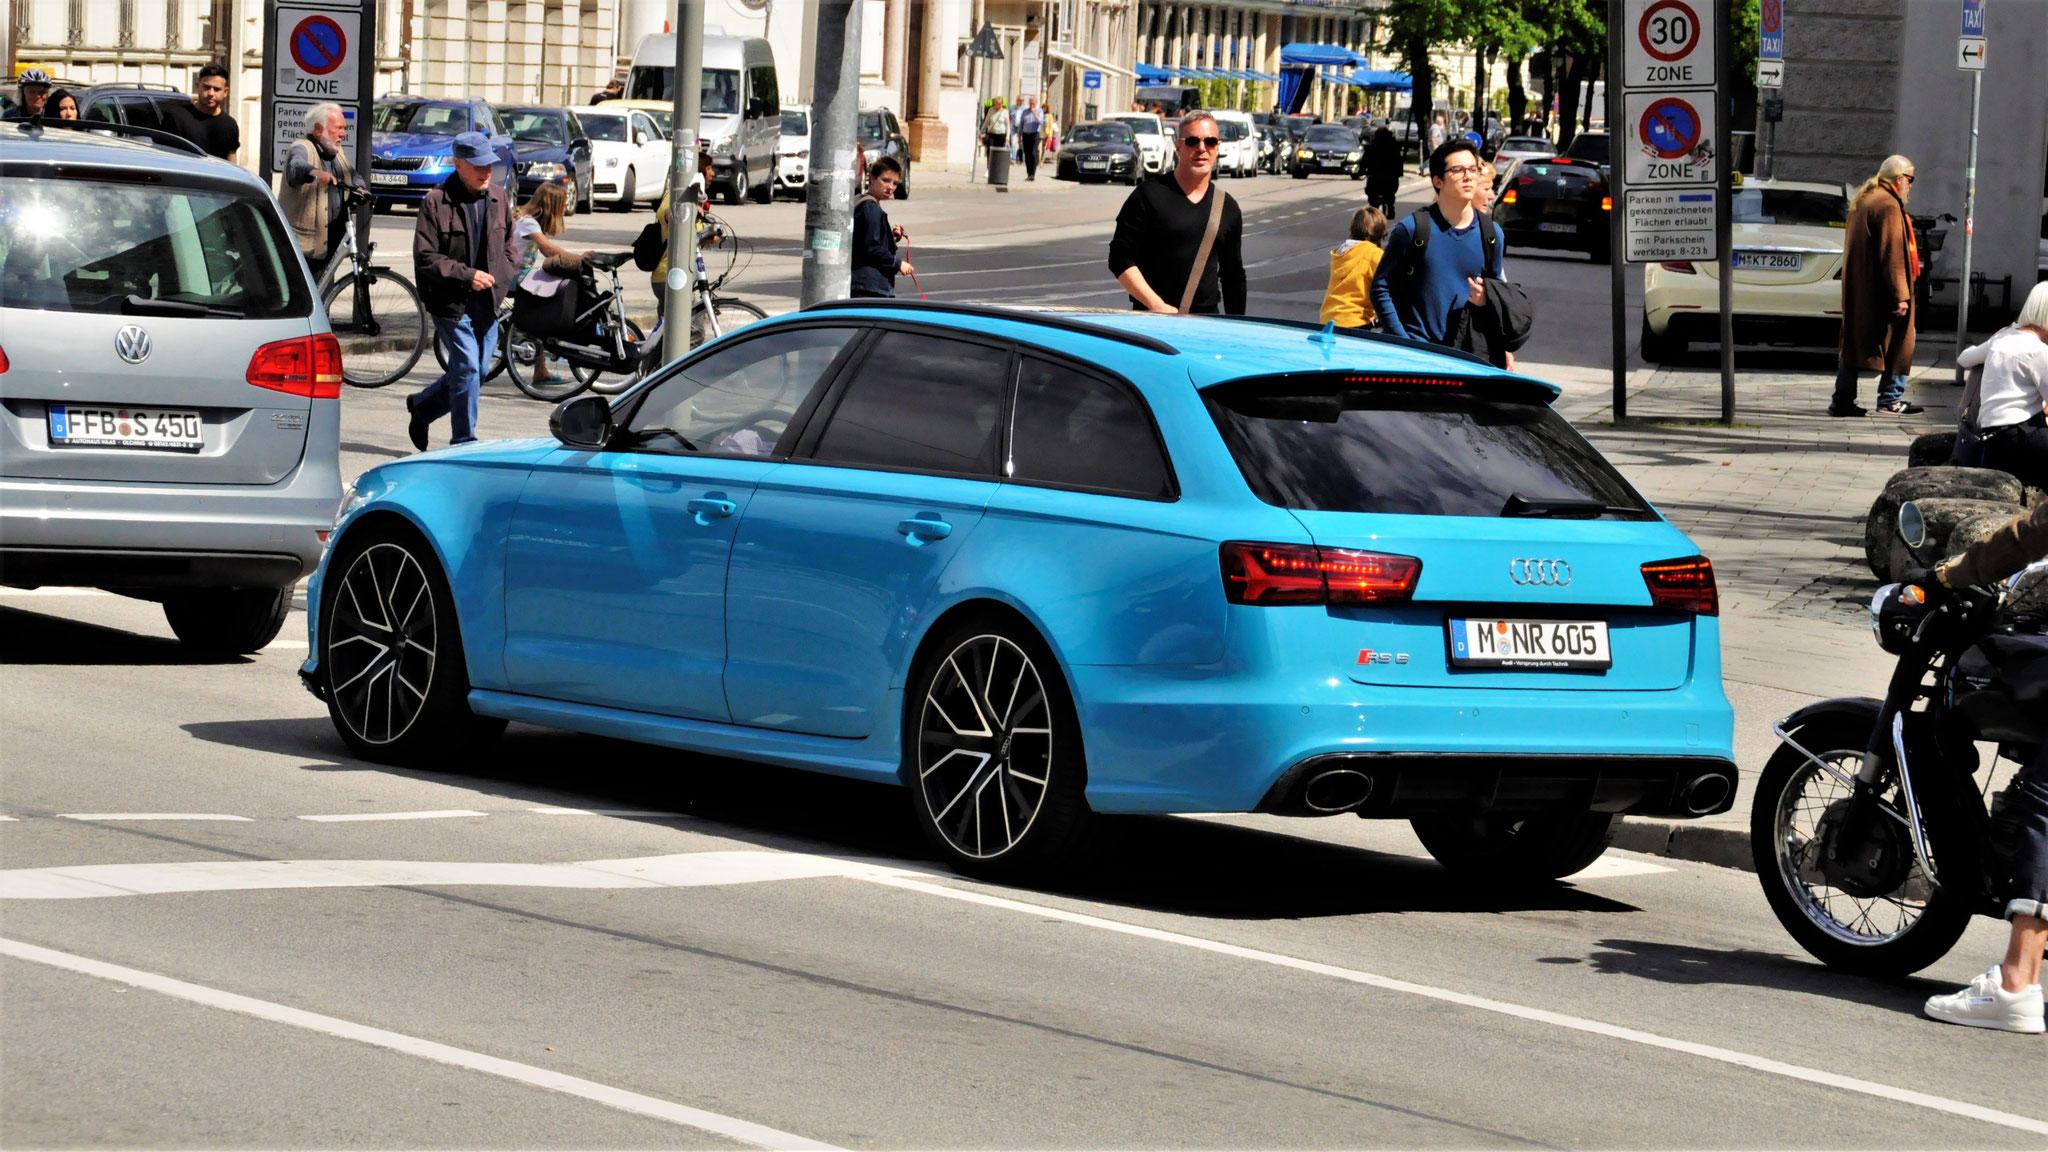 Audi RS6 - M-NR-605